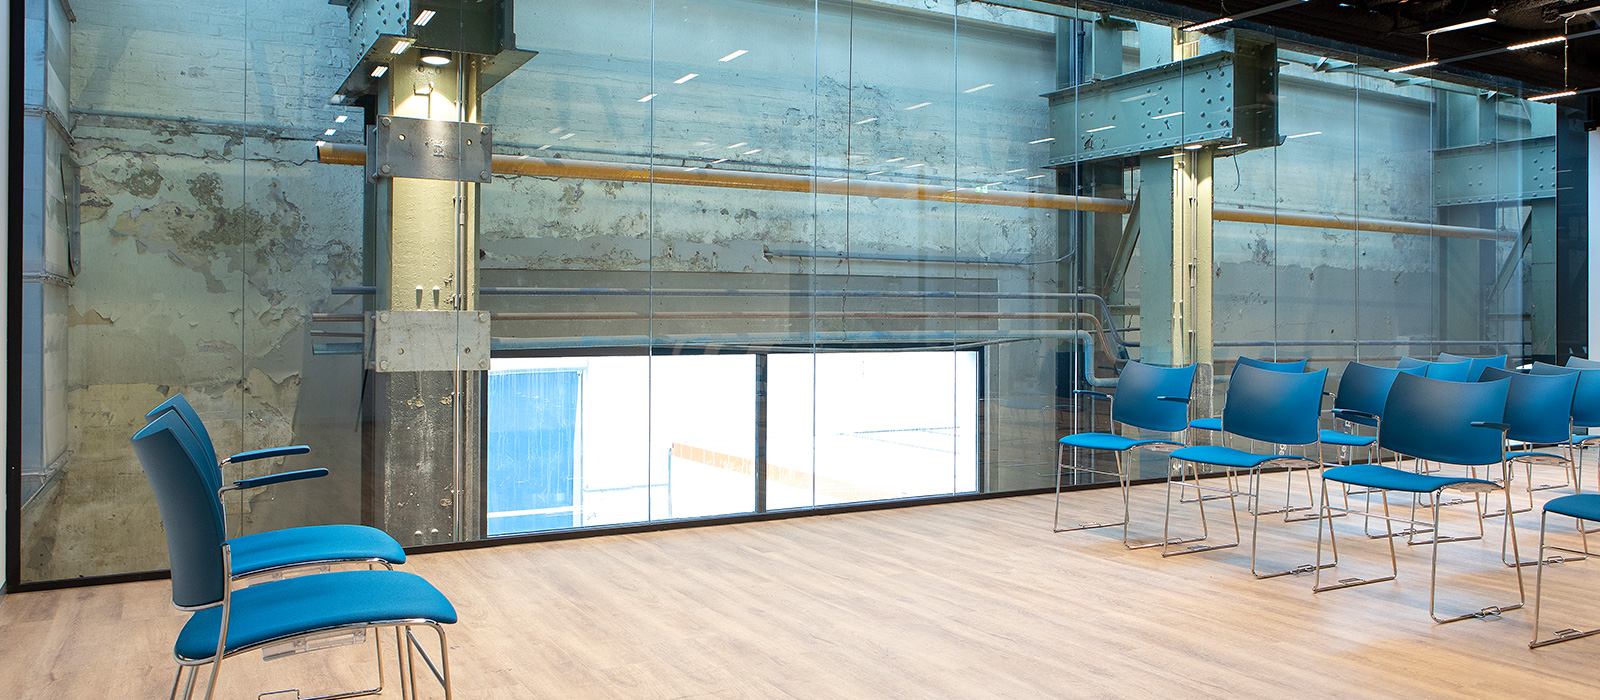 Vitriwand-project-LocHal-Tilburg-017